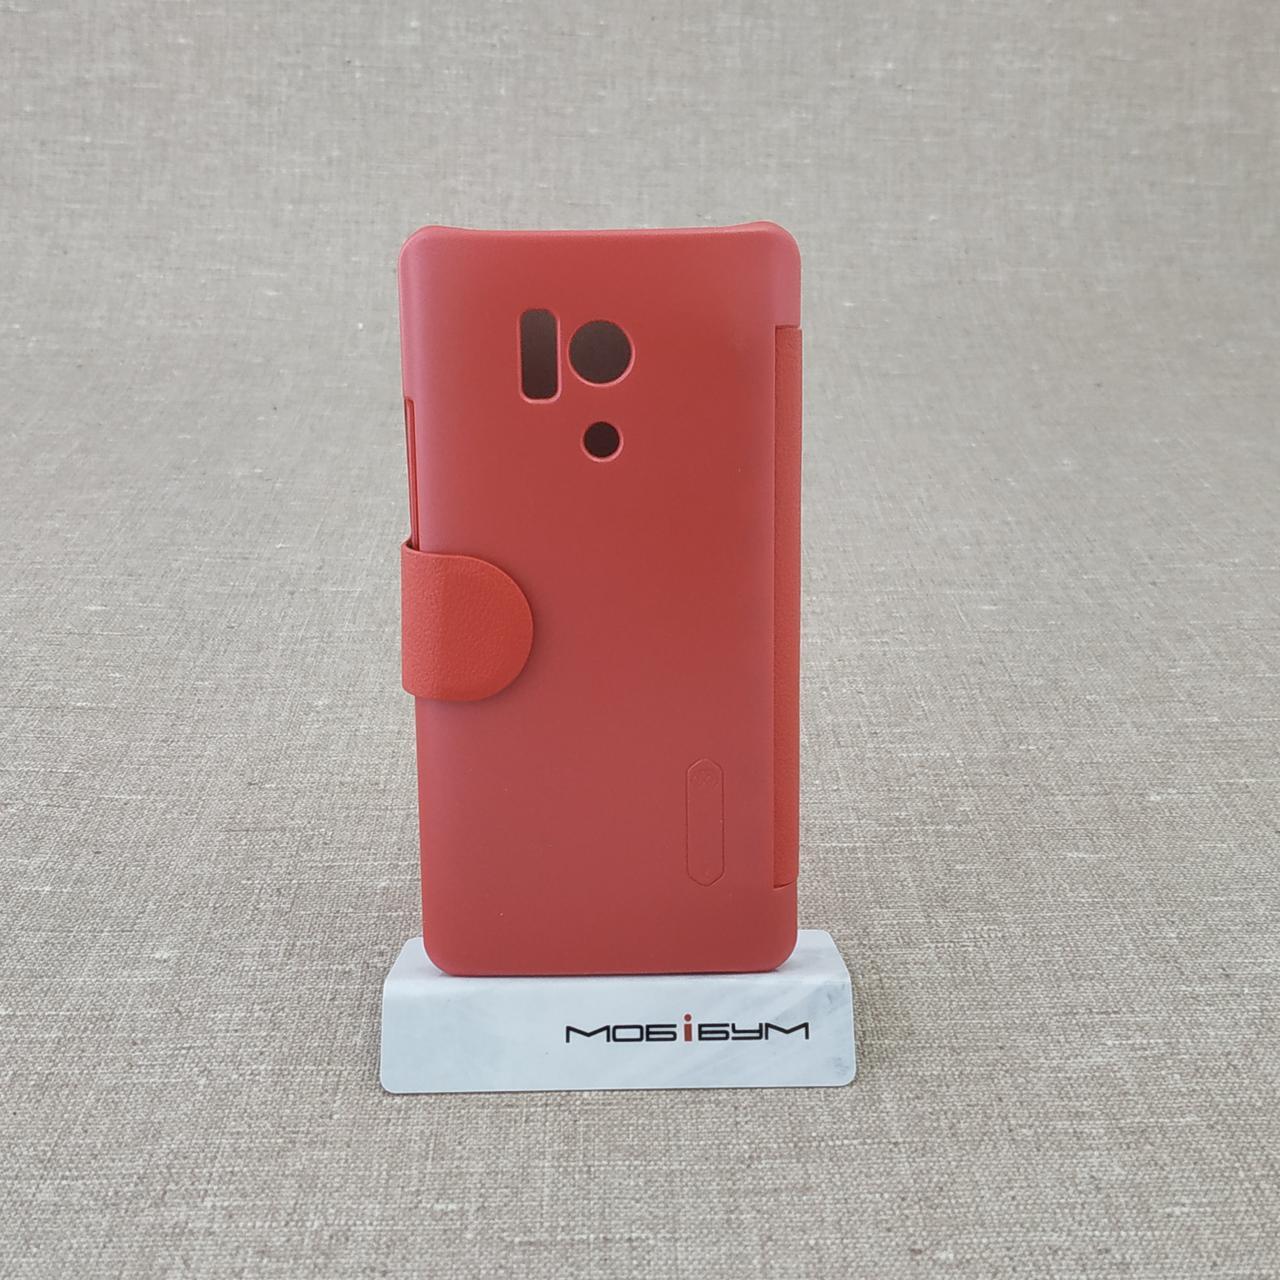 Чехлы для Huawei Nillkin Fresh Honor 3 red Для телефона